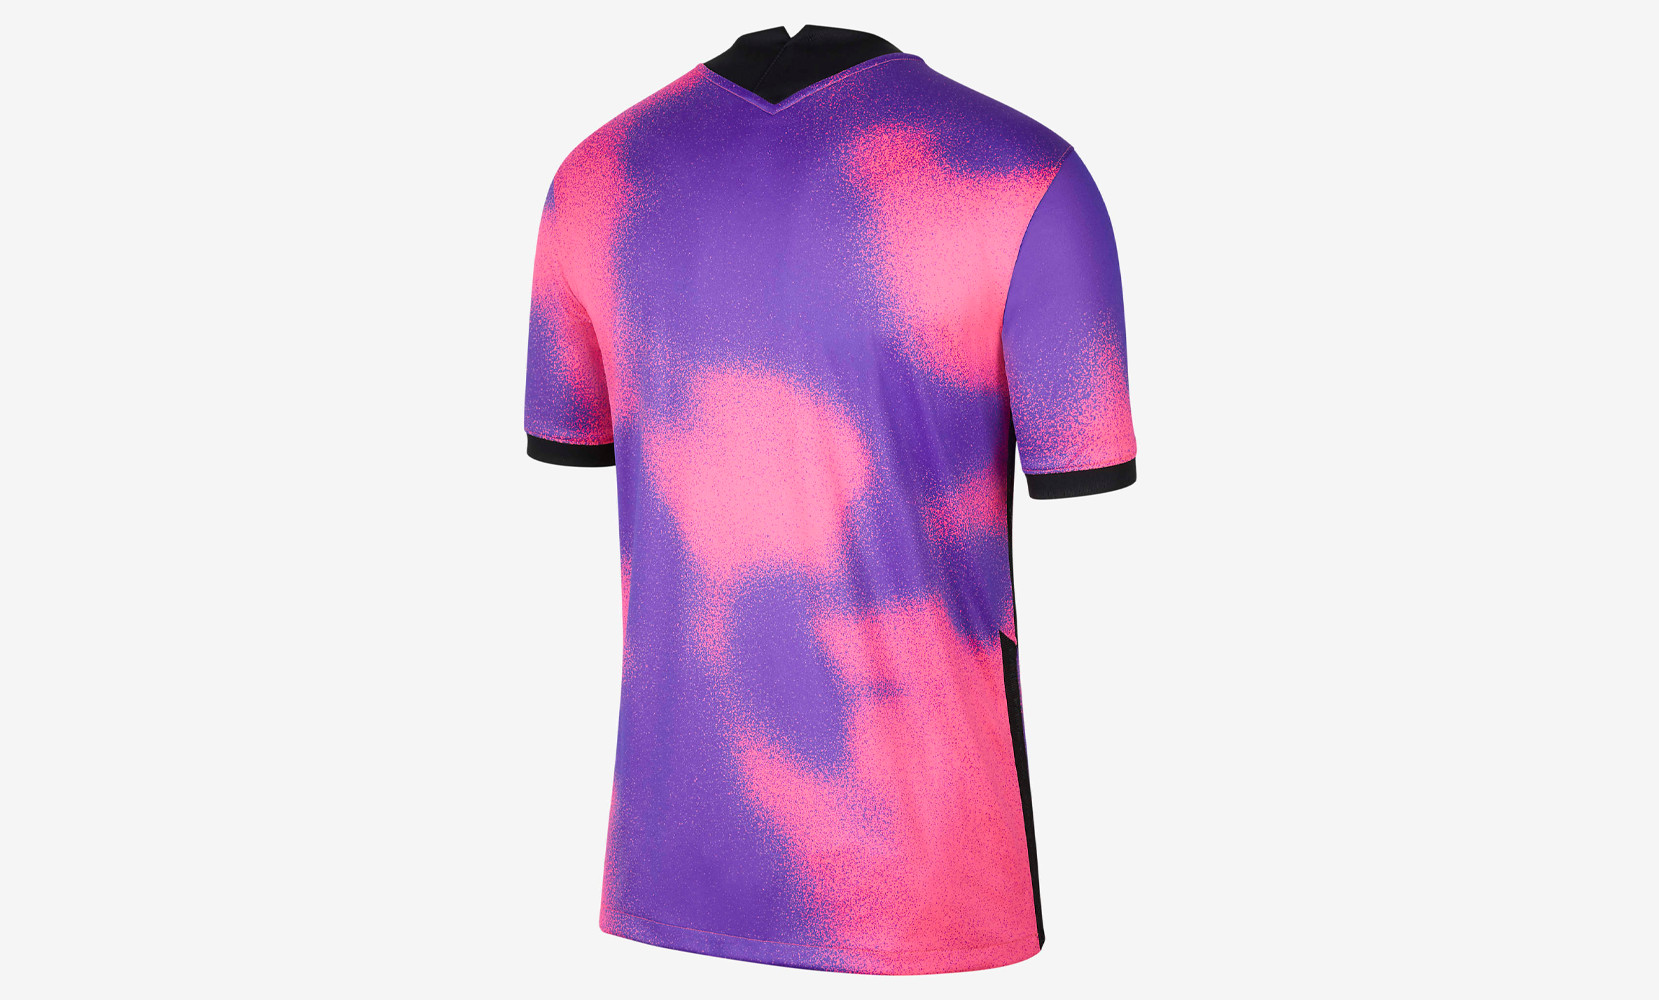 Paris Saint Germain - Jordan Brand - Quarto Kit 2020/21